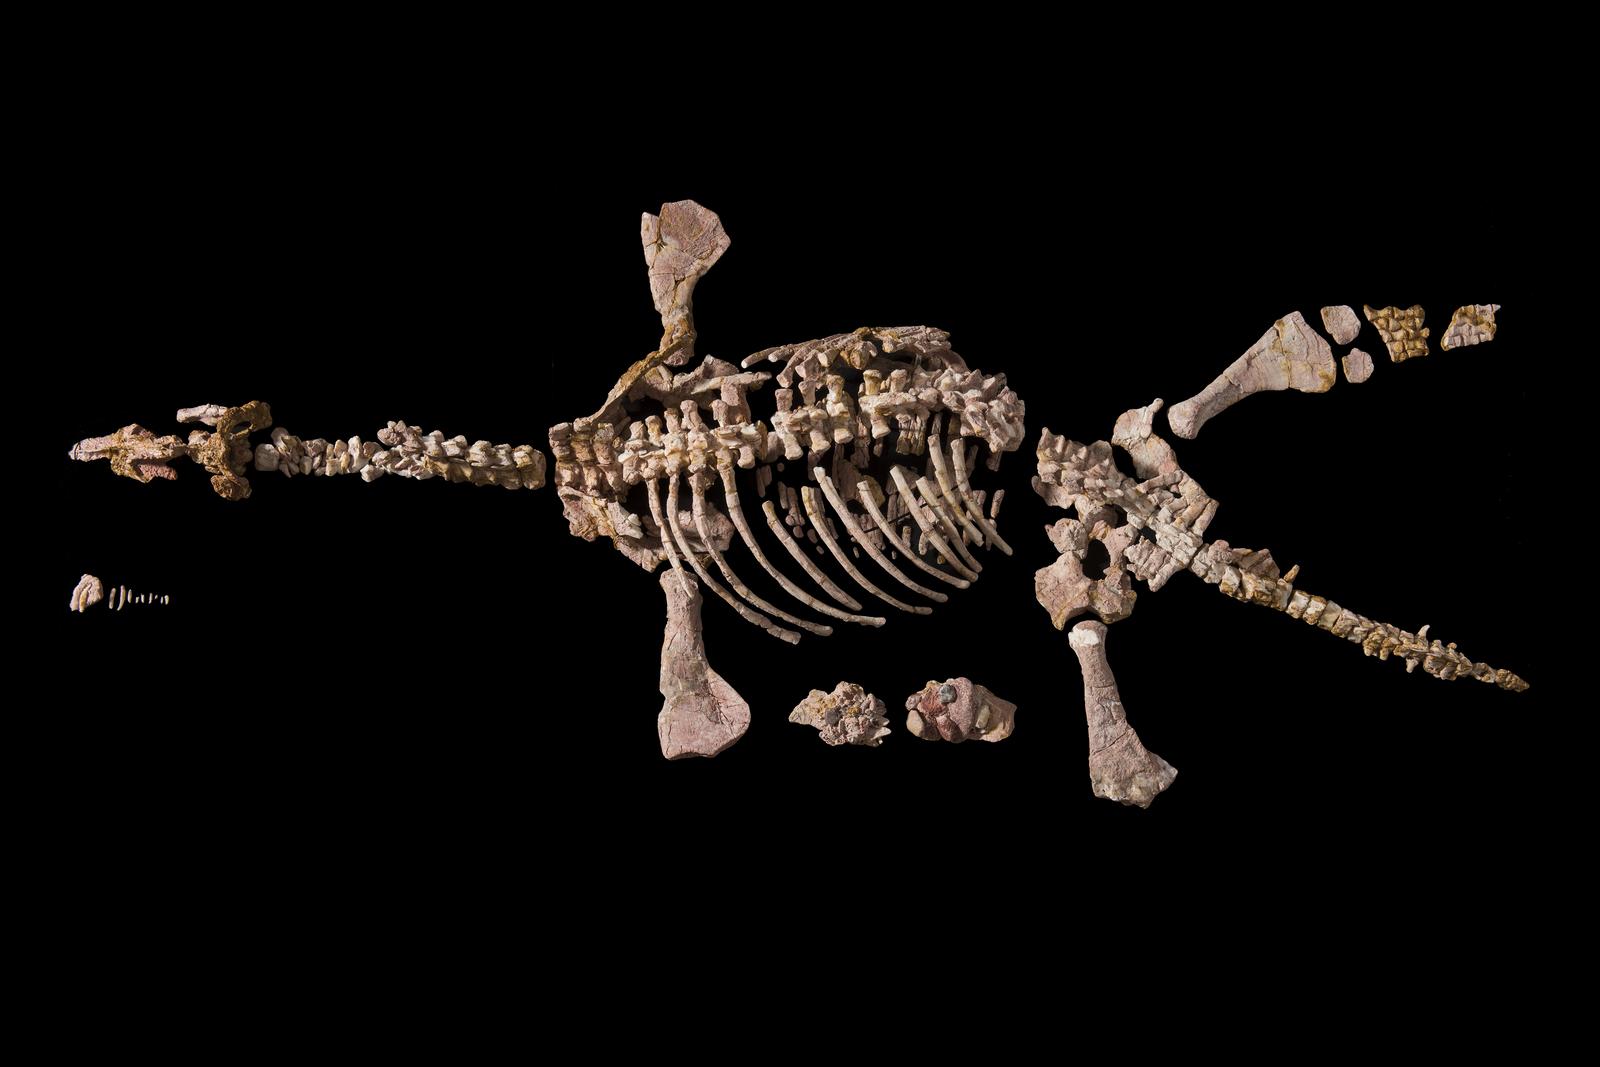 Opalised Pliosaur Umoonasaurus demoscyllus - Eric the Pliosaur